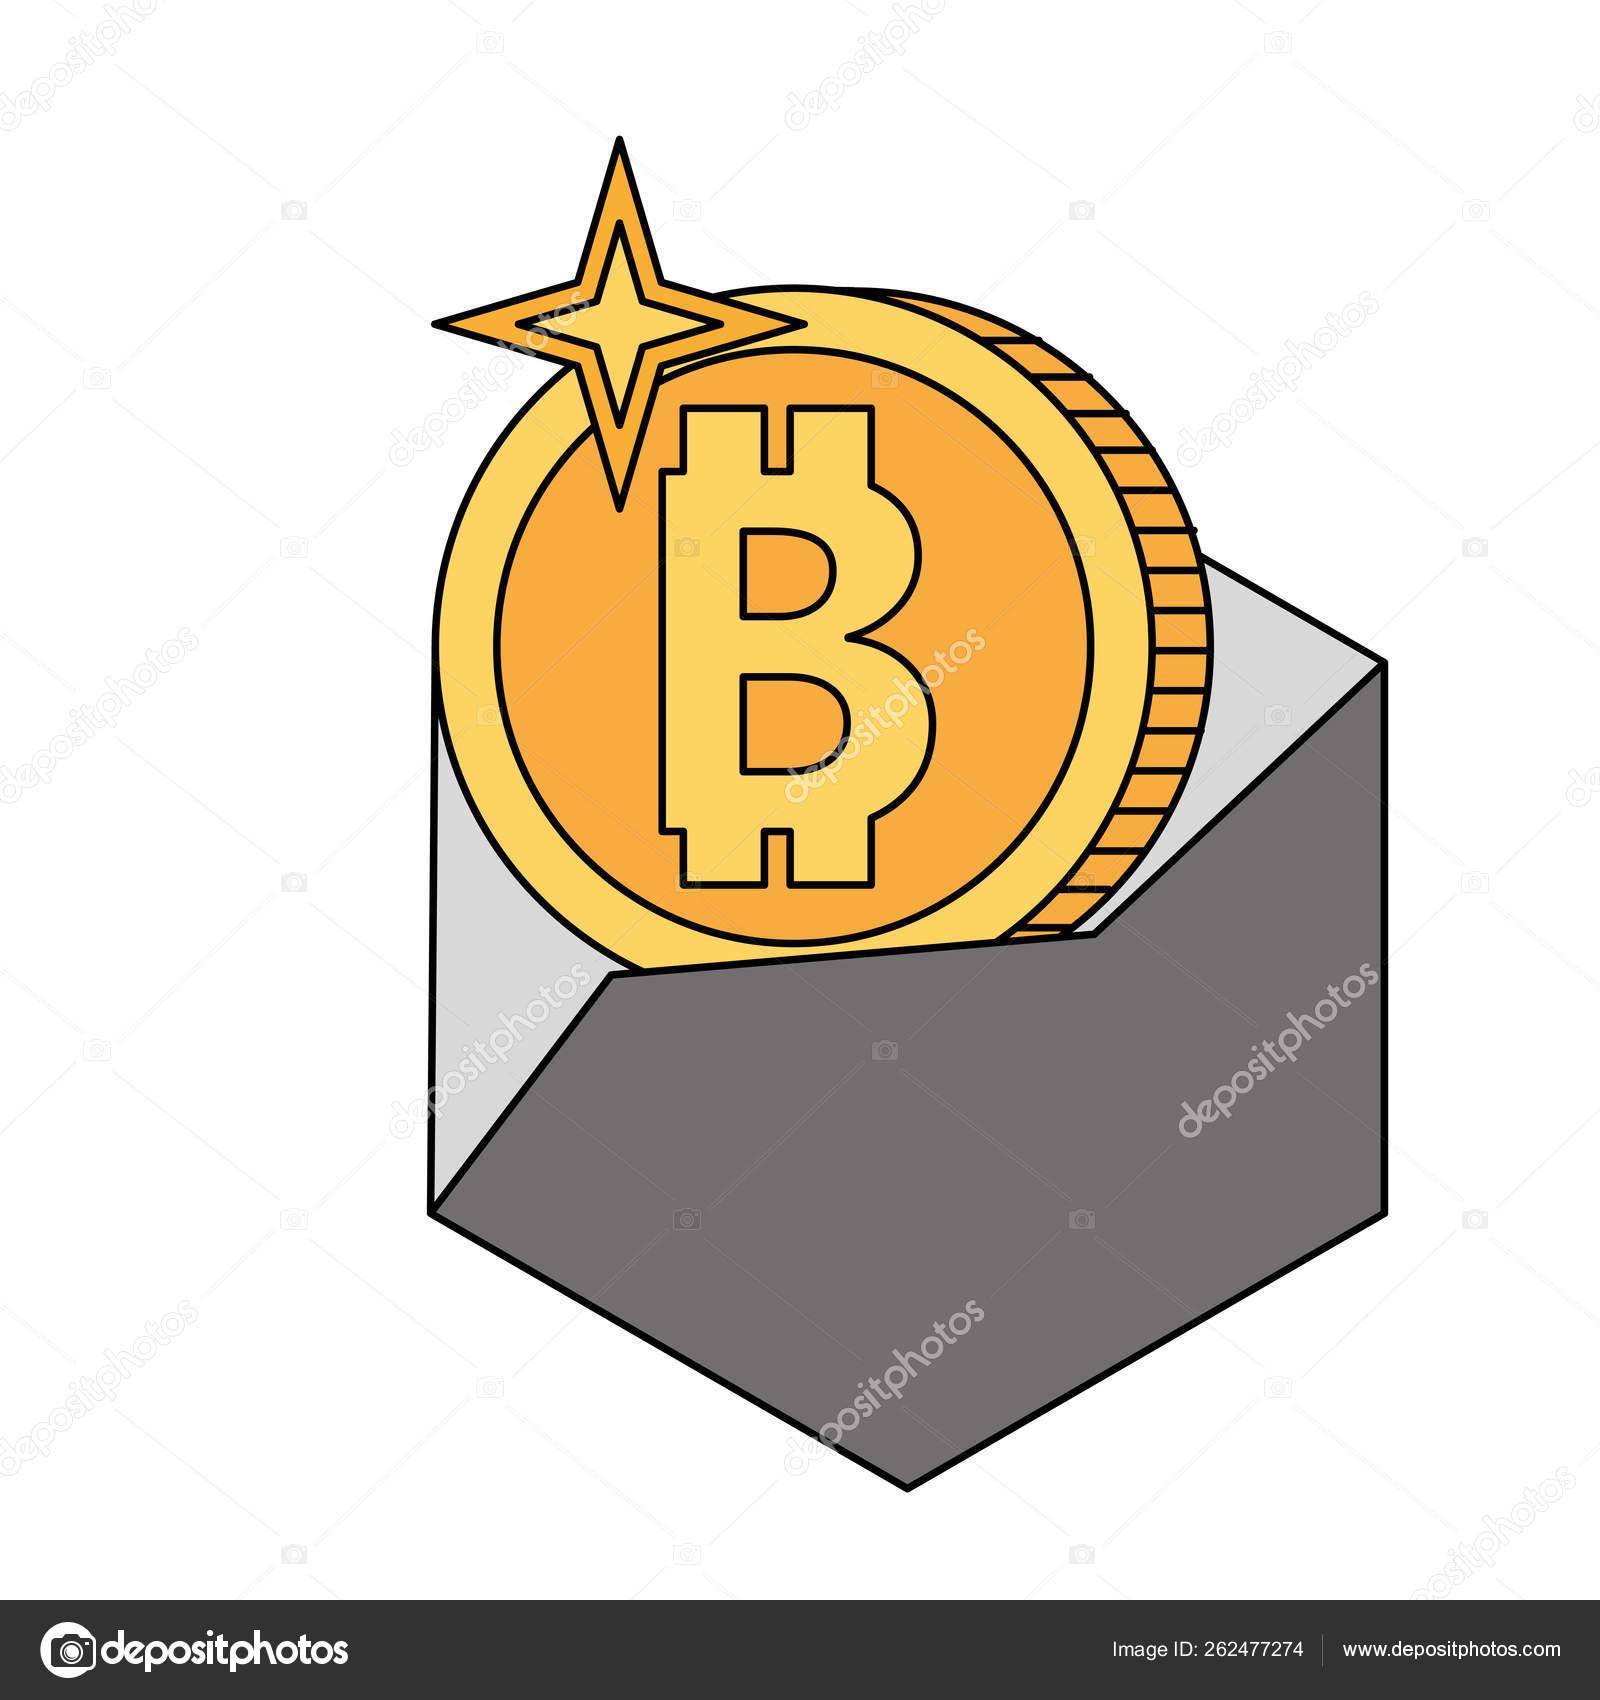 btc private college din gorakhpur shadow brokers bitcoin wallet